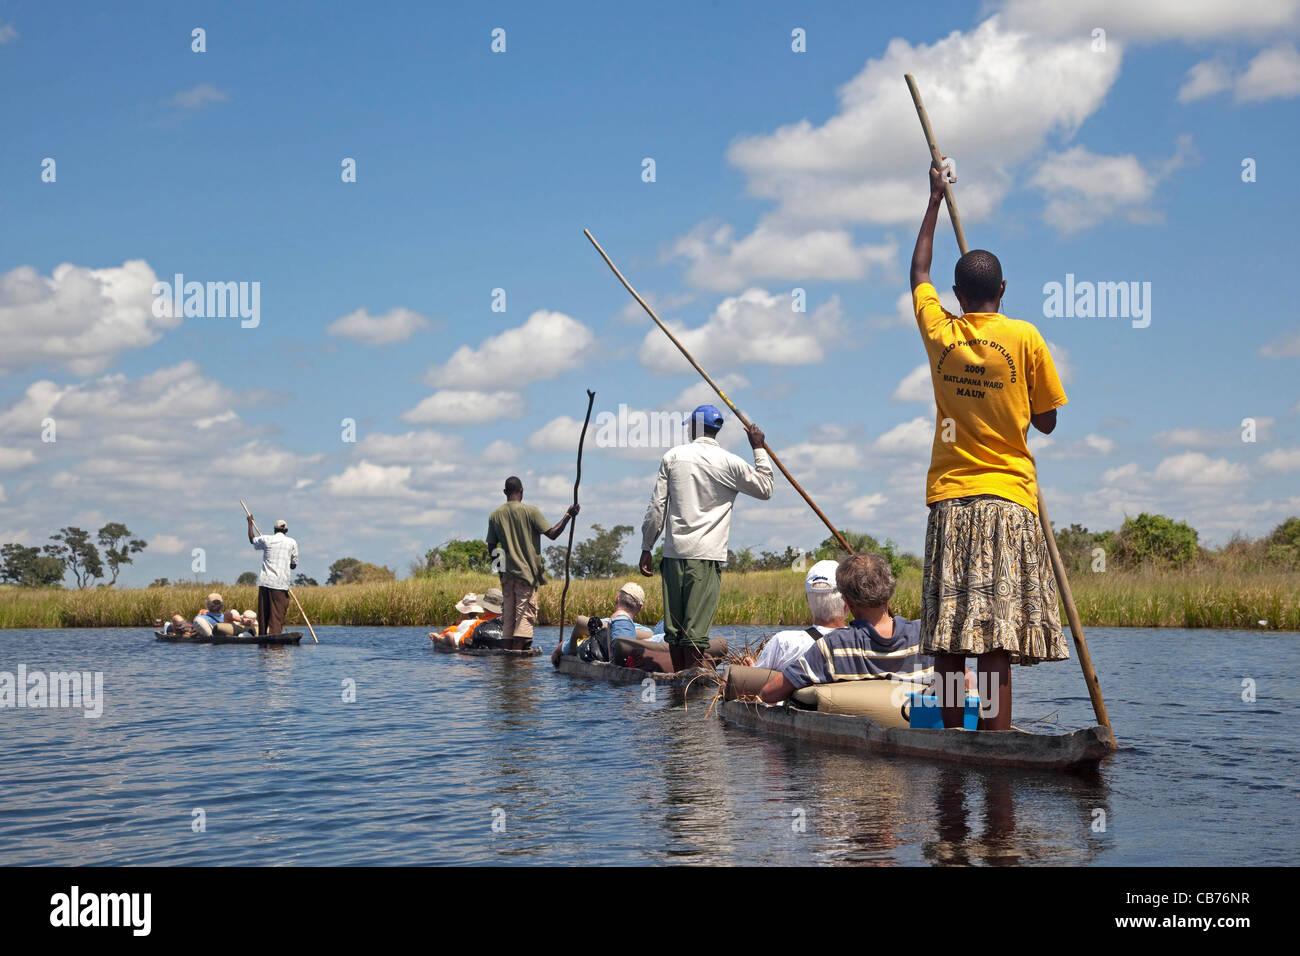 Tourists traveling in traditional wooden canoes, mokoro / makoro in the Okavango Delta, Botswana, Africa - Stock Image